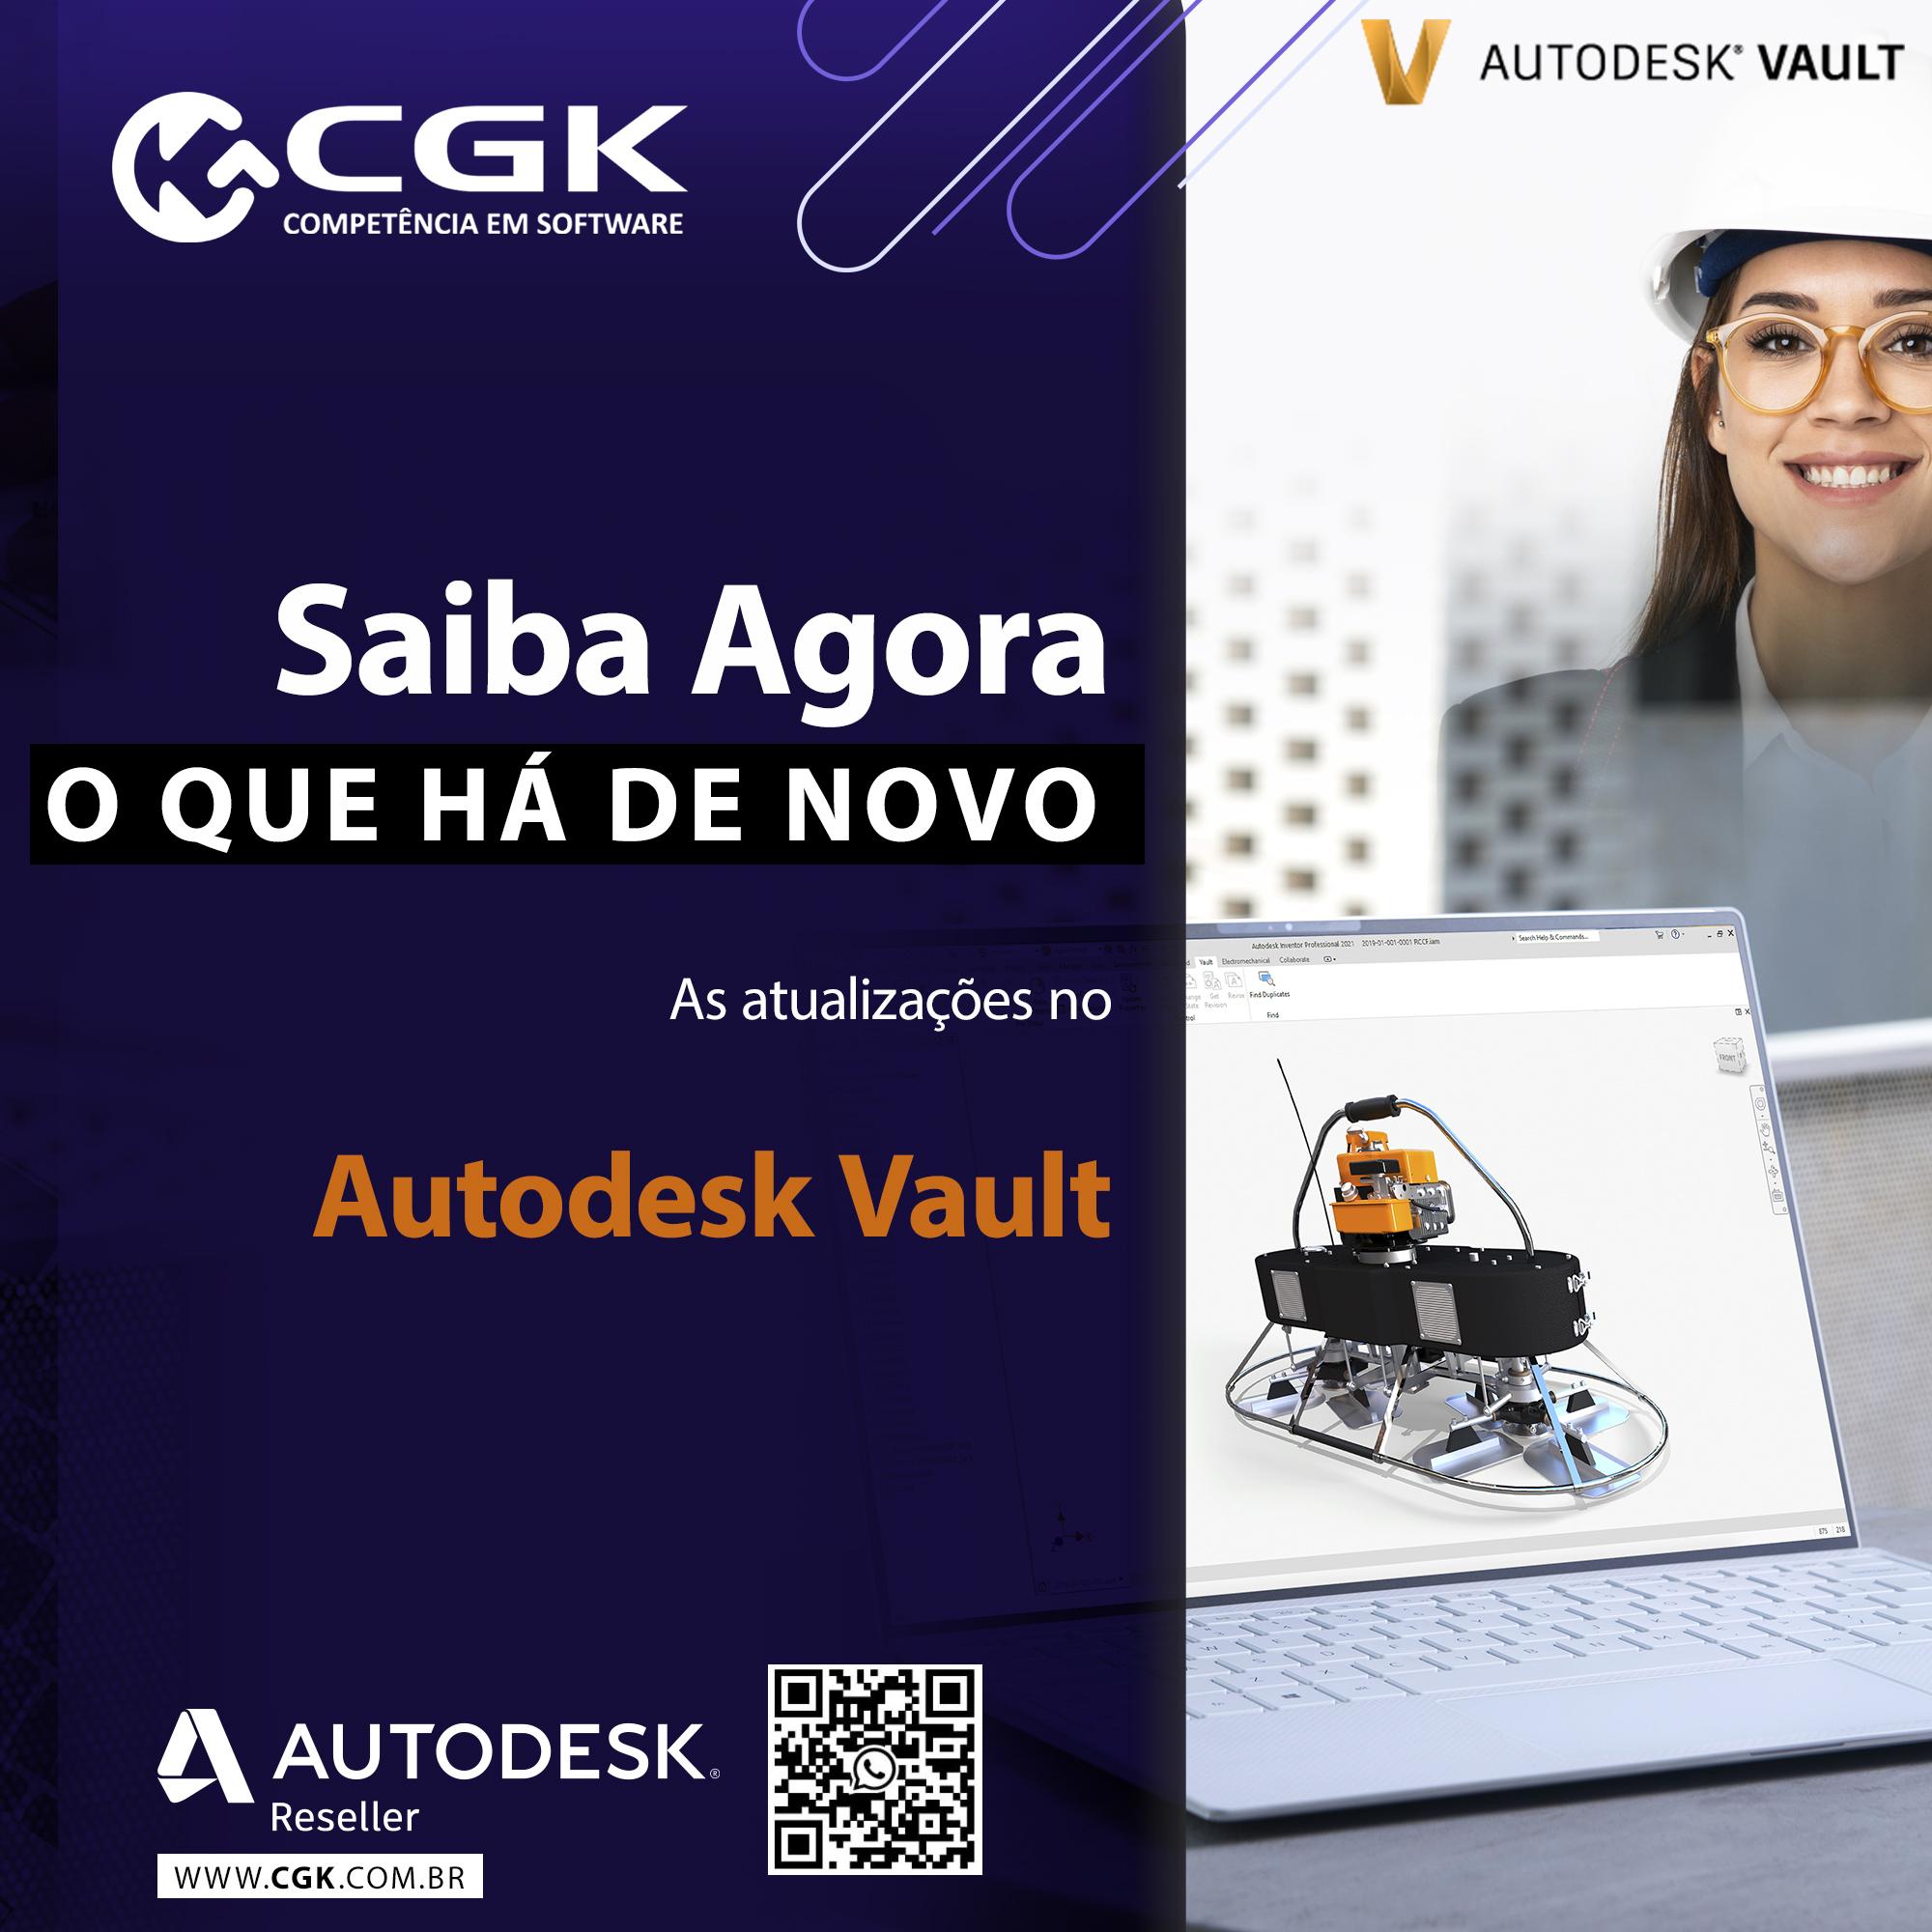 Autodesk Vault 2022